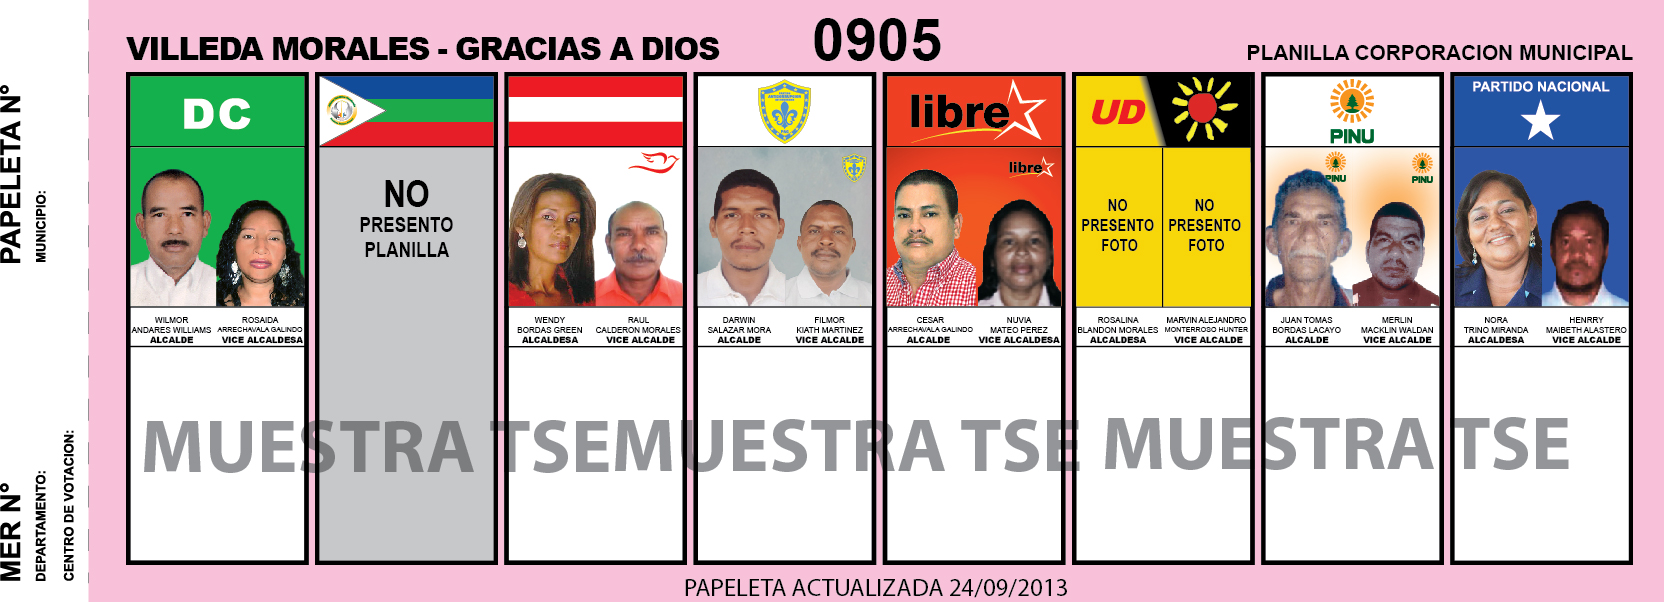 CANDIDATOS 2013 MUNICIPIO VILLEDA MORALES - GRACIAS A DIOS - HONDURAS